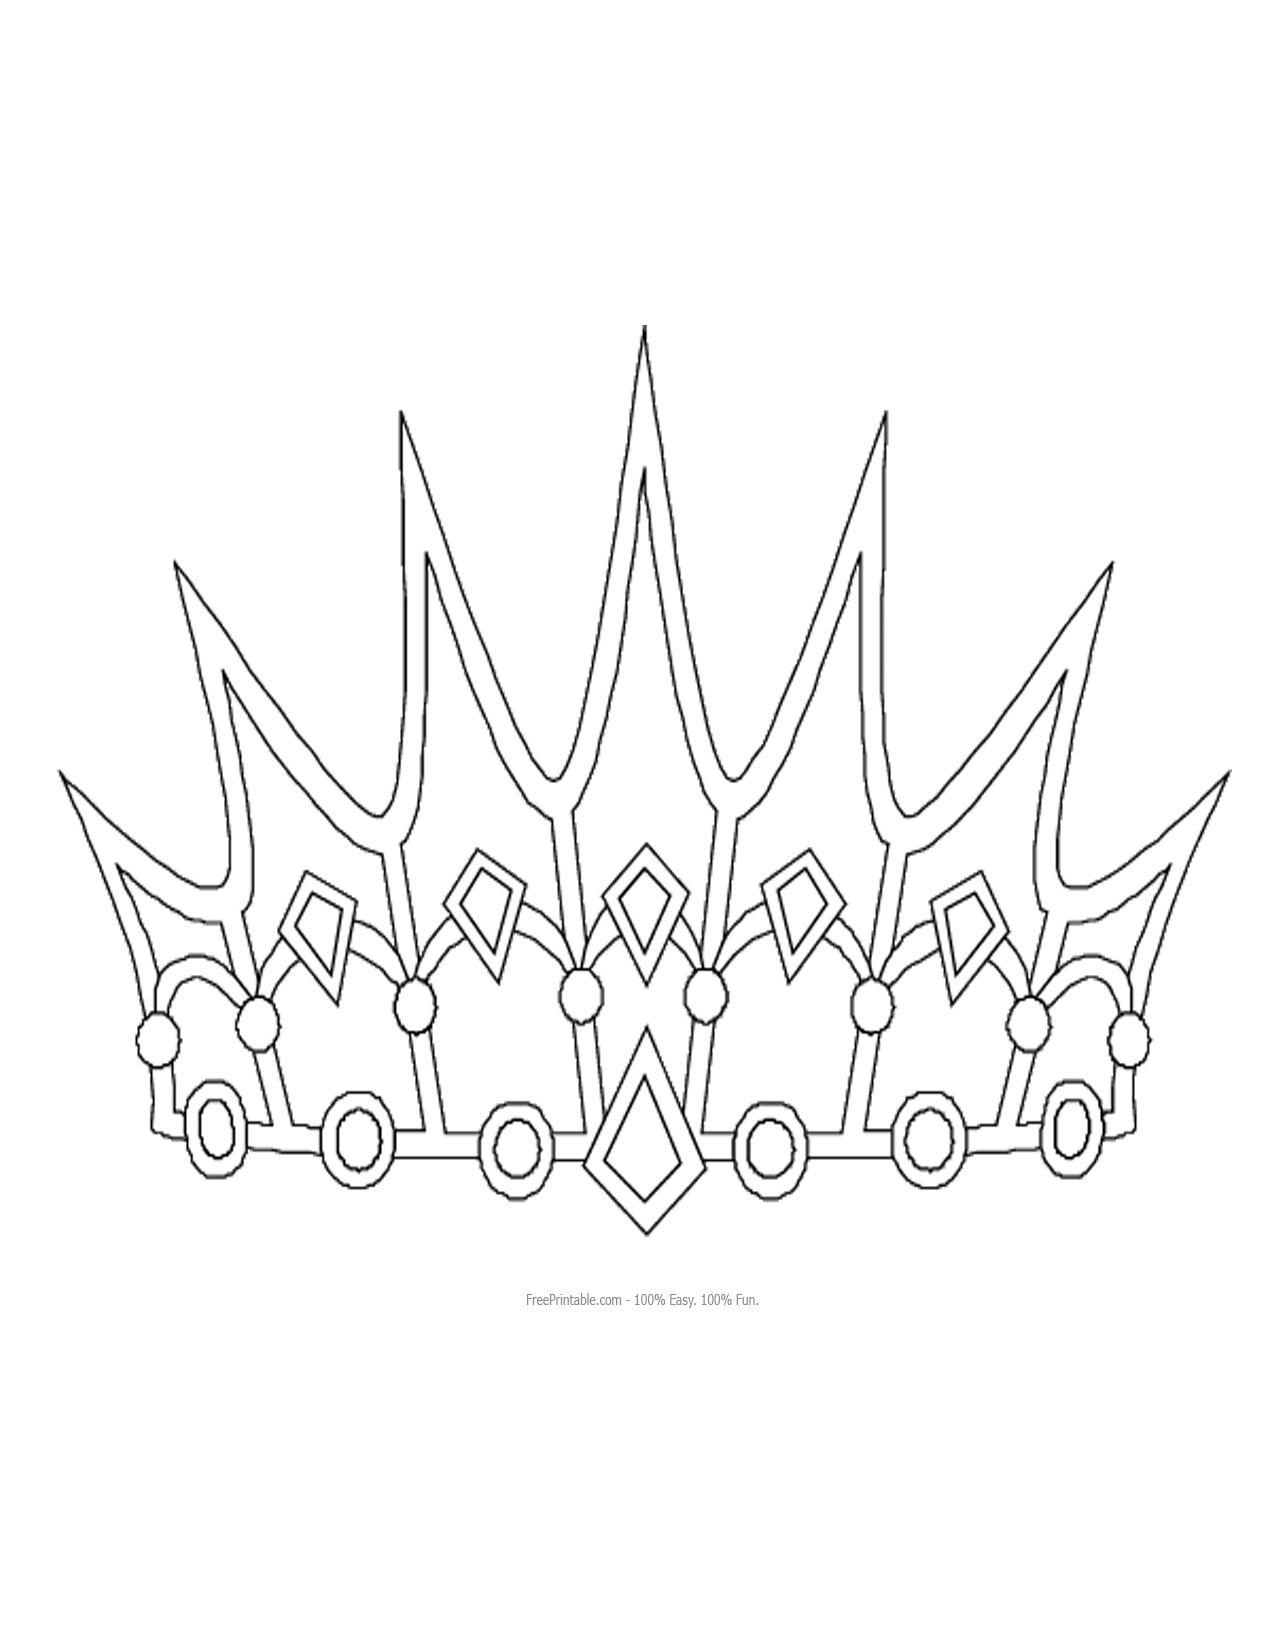 Free Printable Princess Crown Shapes   Print - Princess Crown   3D - Free Printable Crown